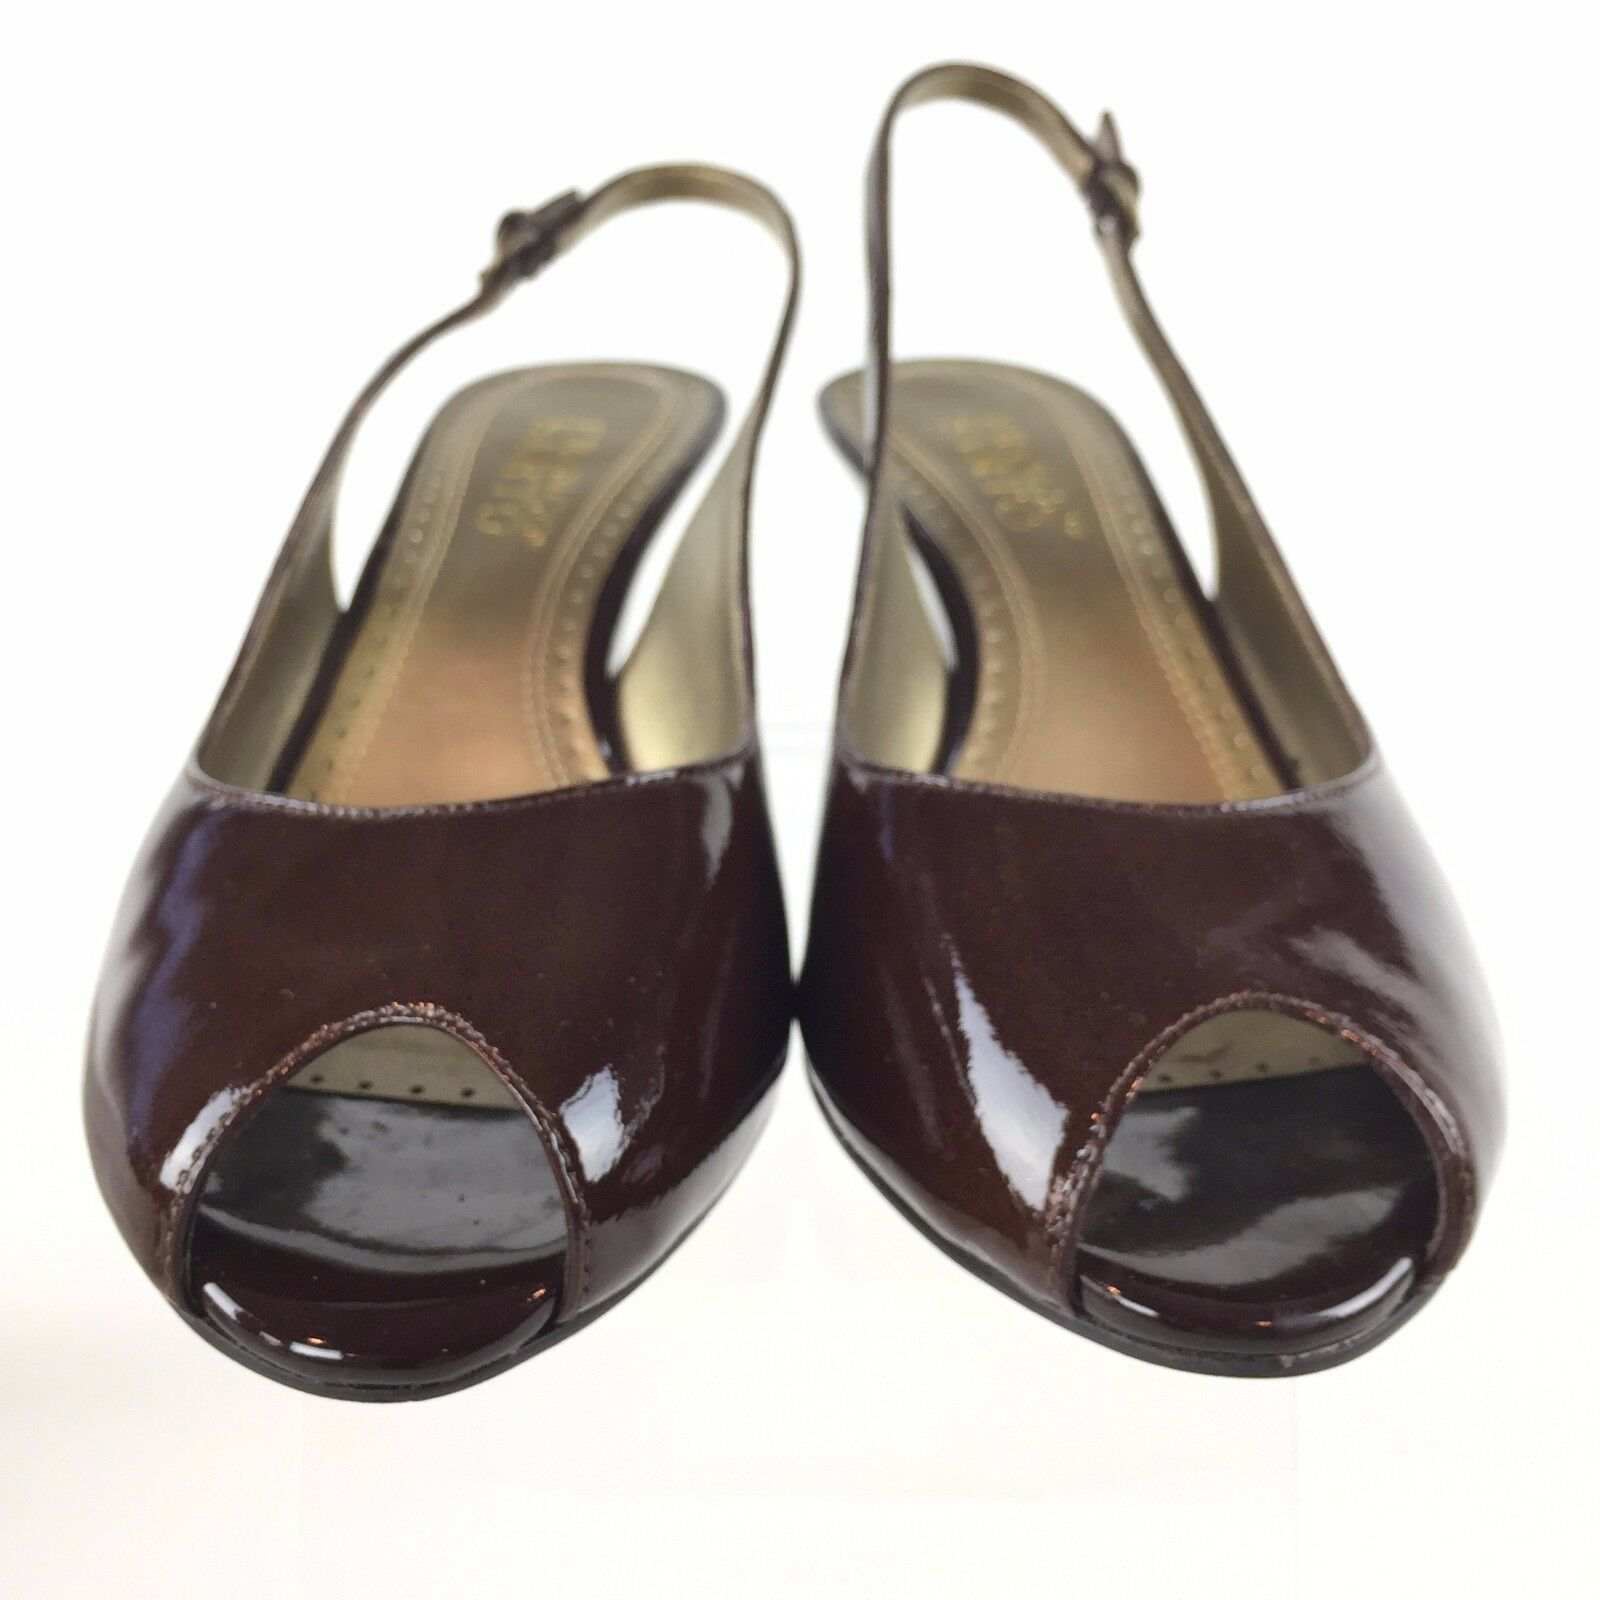 42585ed25c1 Buy Franco Sarto Brown Patent Leather Slingback Pump PEEP Toe Blaze 7.5m  Demi Wedge online